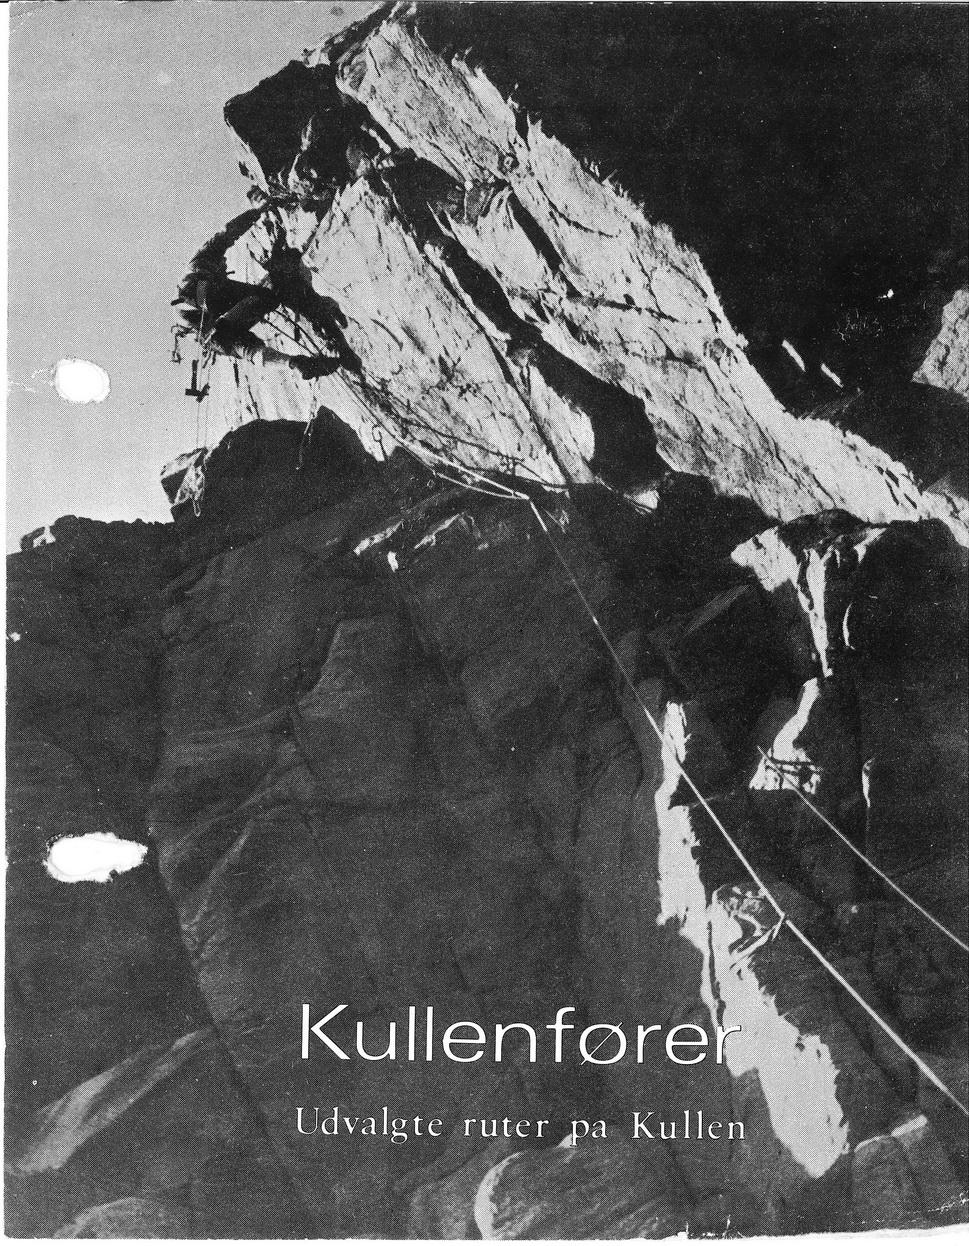 Kullen guide 1972 001.jpg